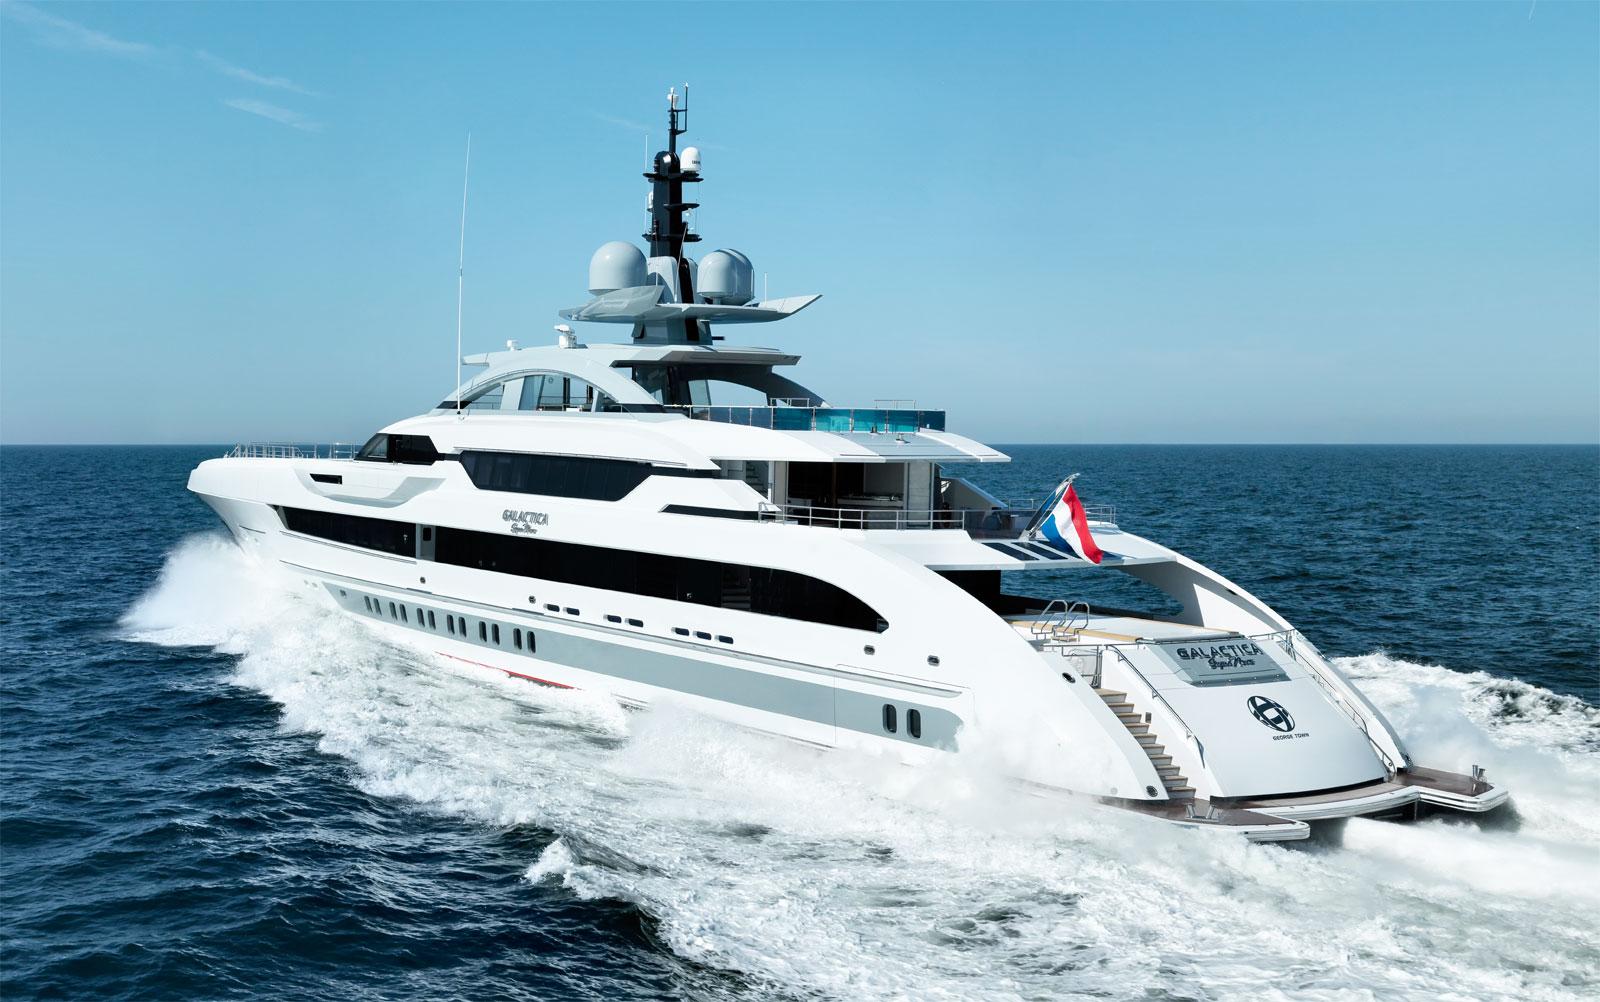 An Amazing Experience In The Côte d'Azur Aboard The Heesen Galactica Super Nova 7